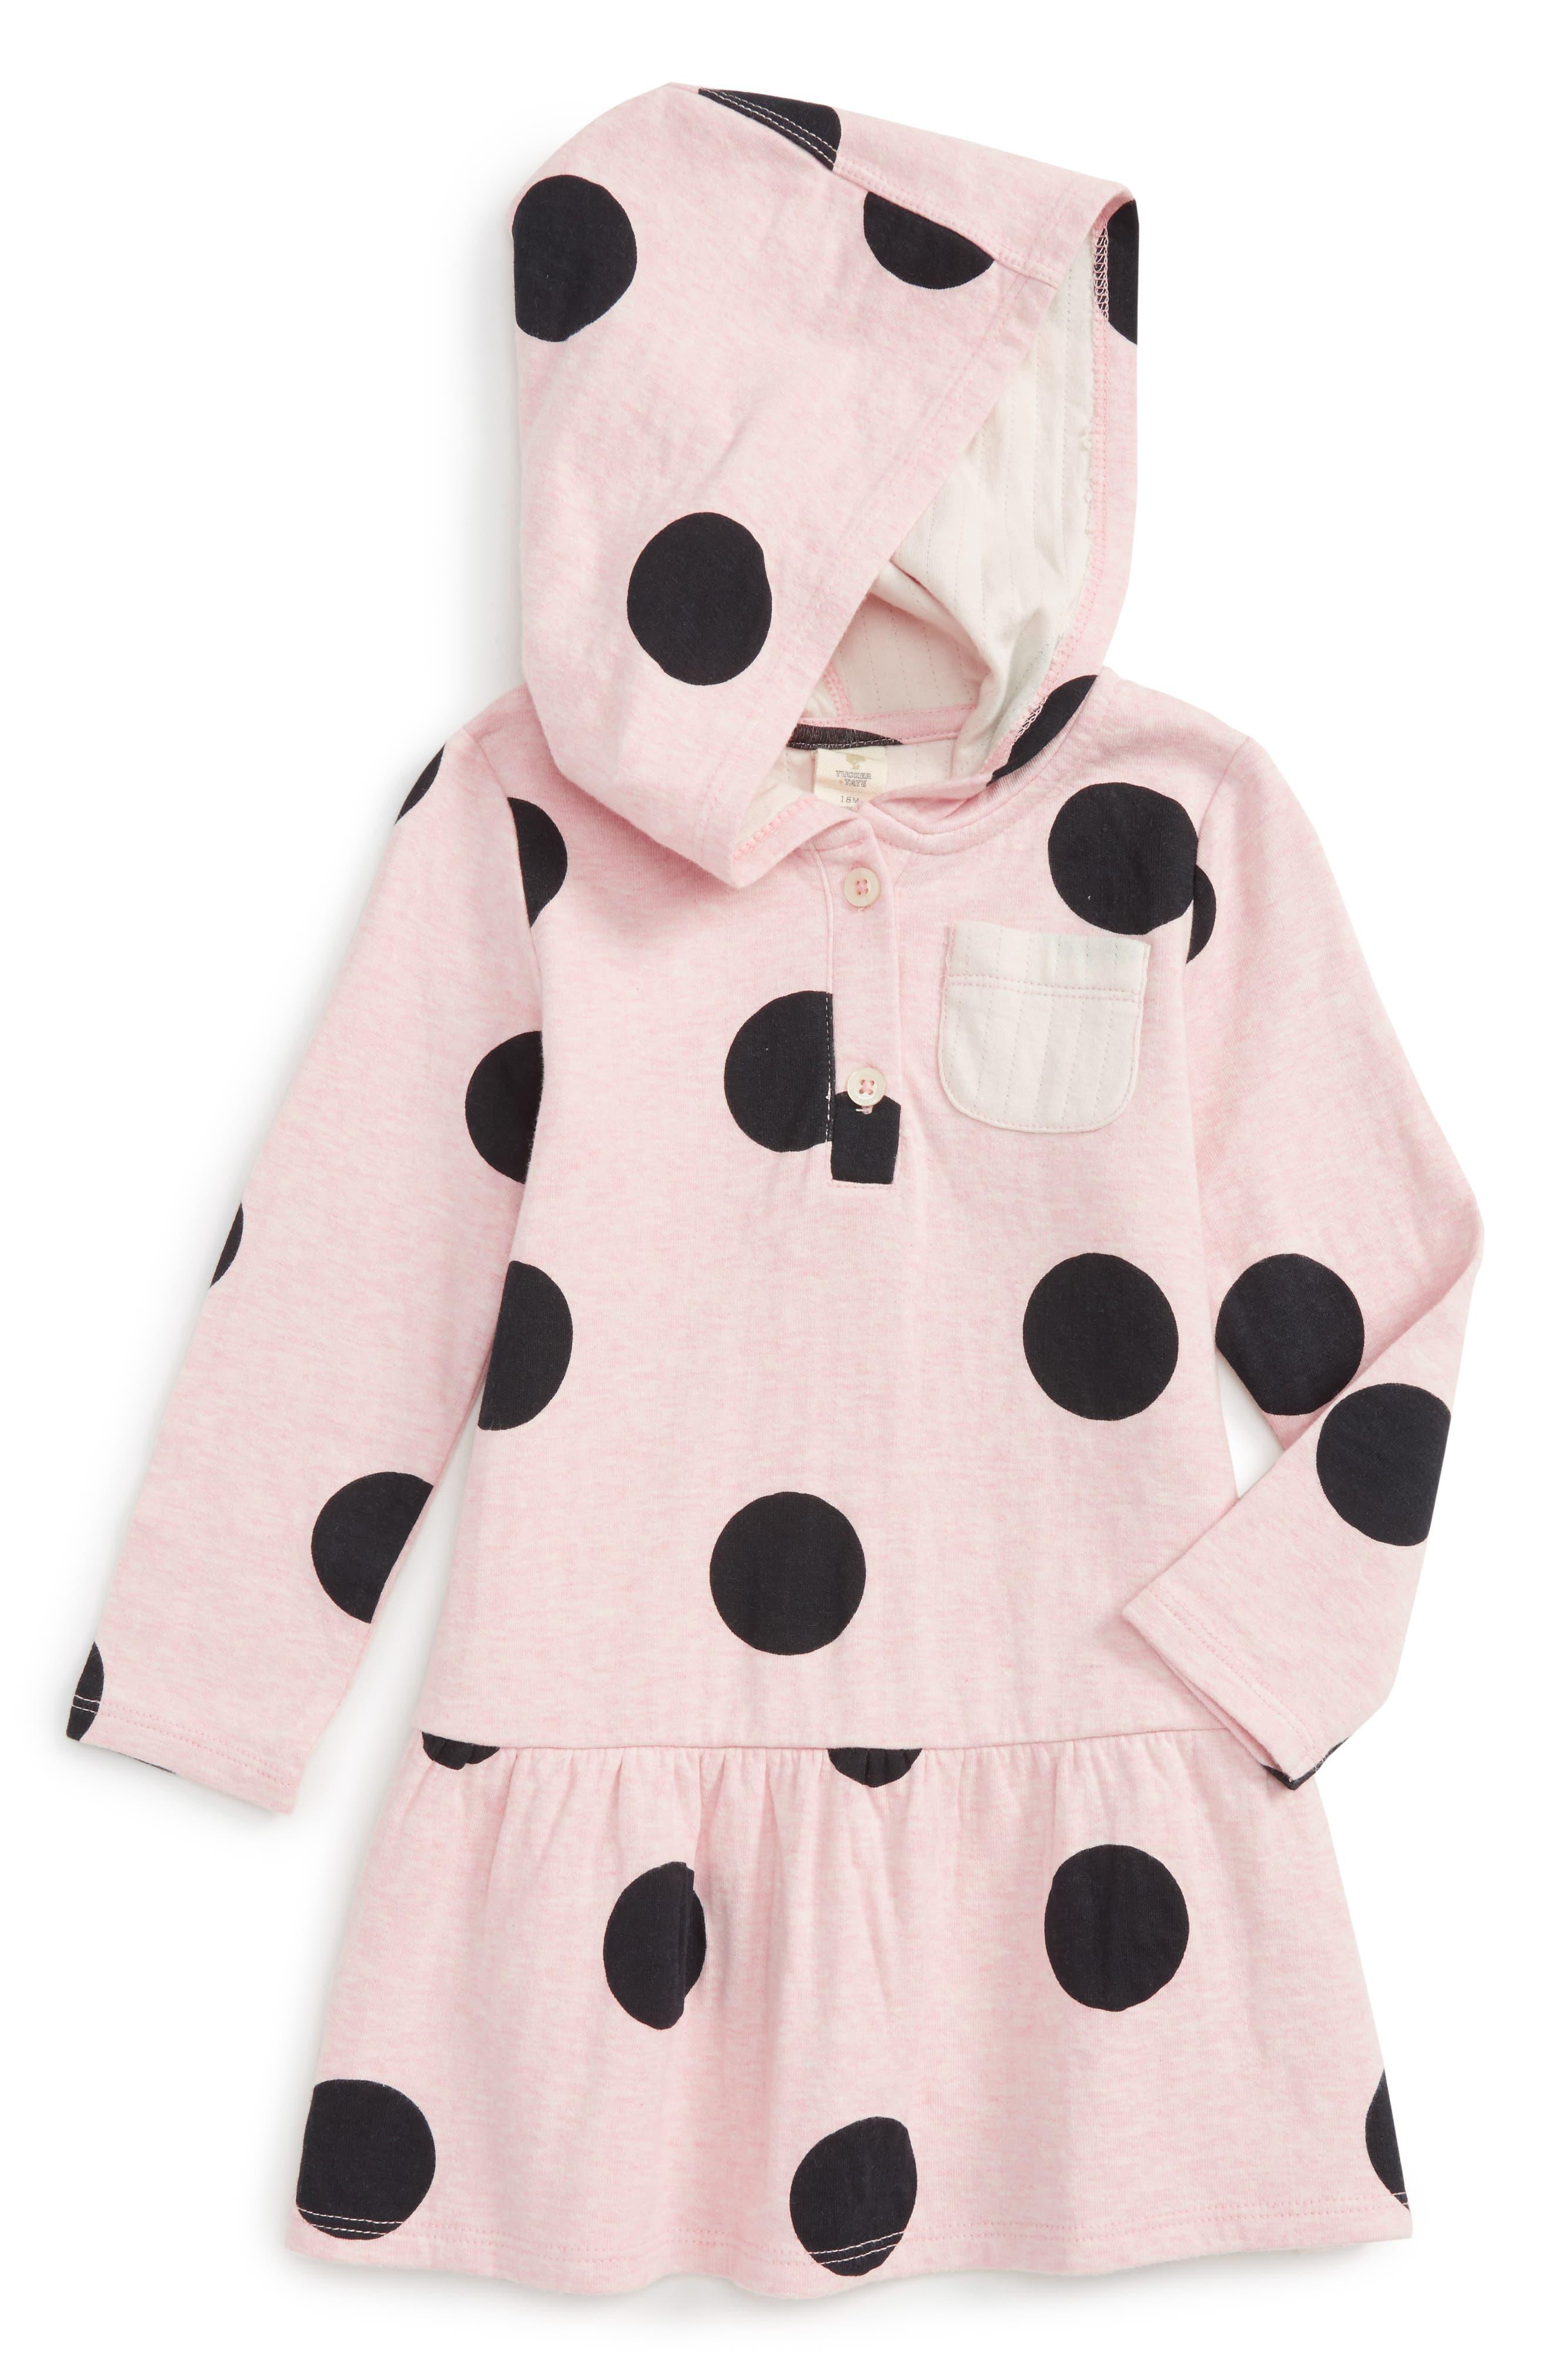 Alternate Image 1 Selected - Tucker + Tate Hooded Dress (Baby Girls)